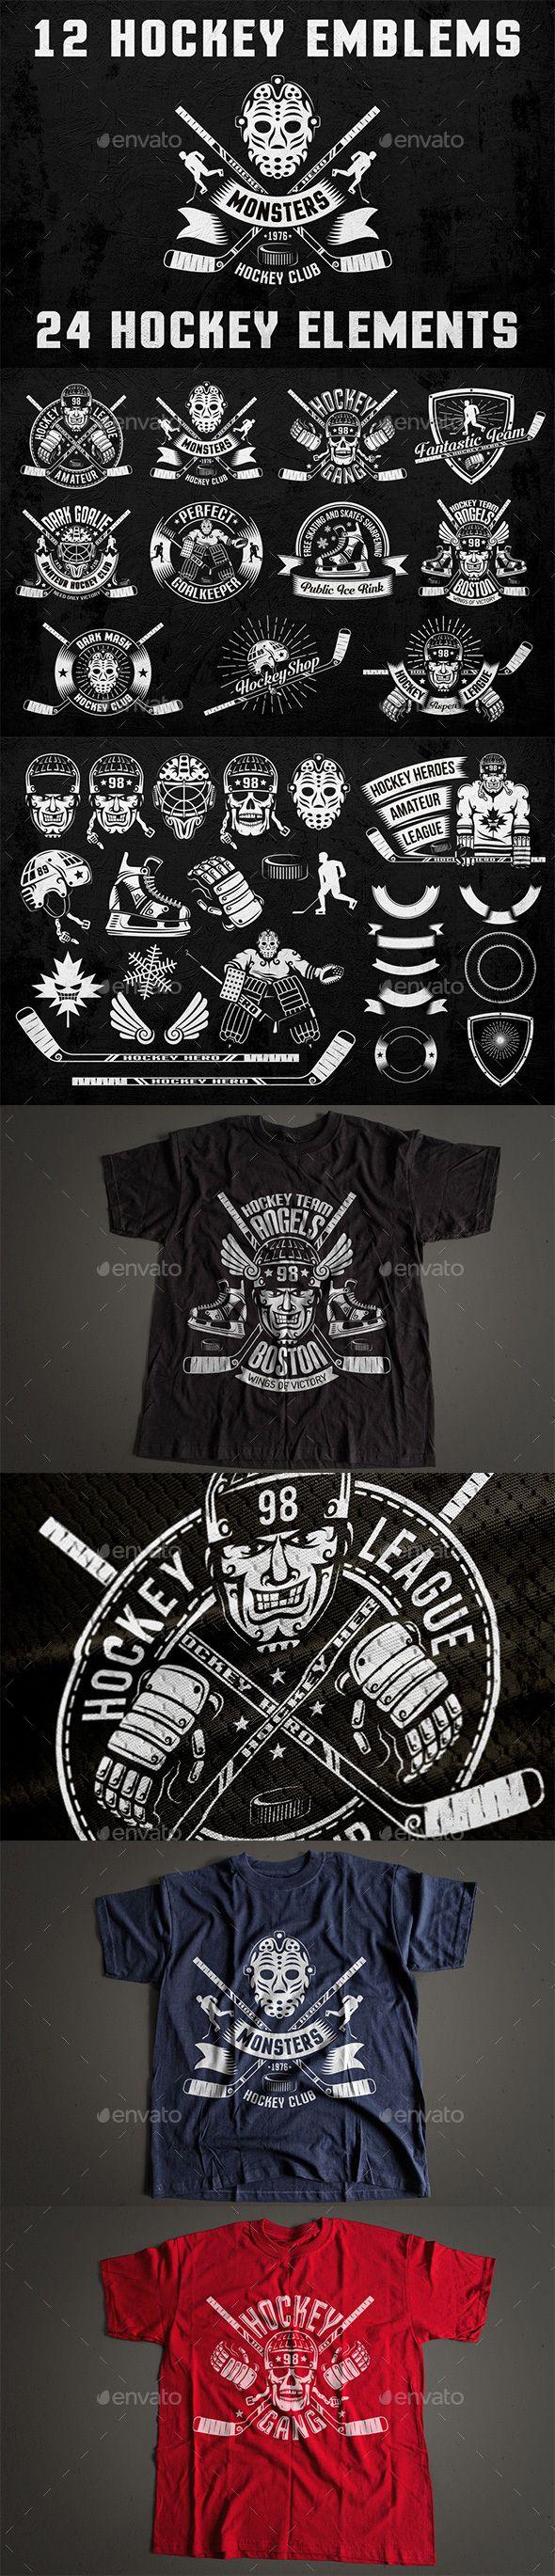 Car body sticker design eps - Hockey Logo On Dark Templates Psd Vector Eps